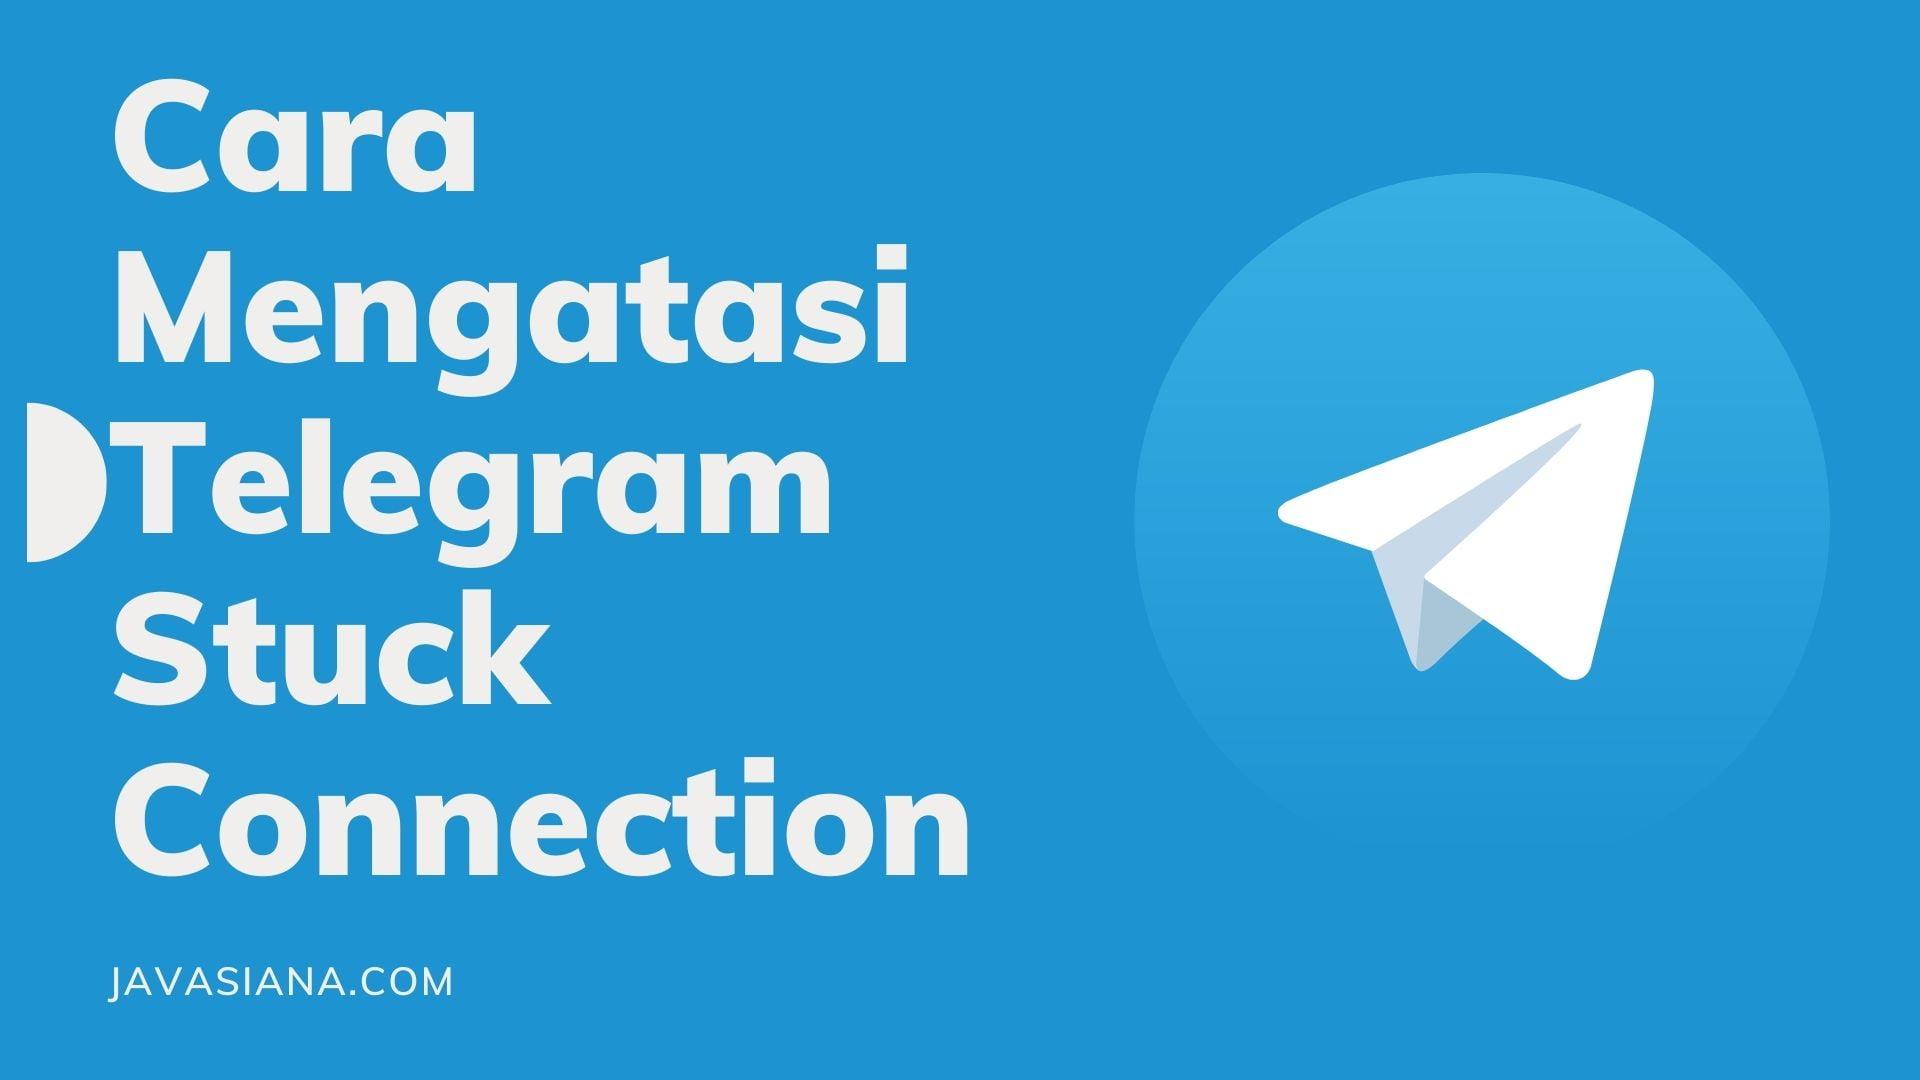 Cara Mengatasi Telegram Stuck Connection